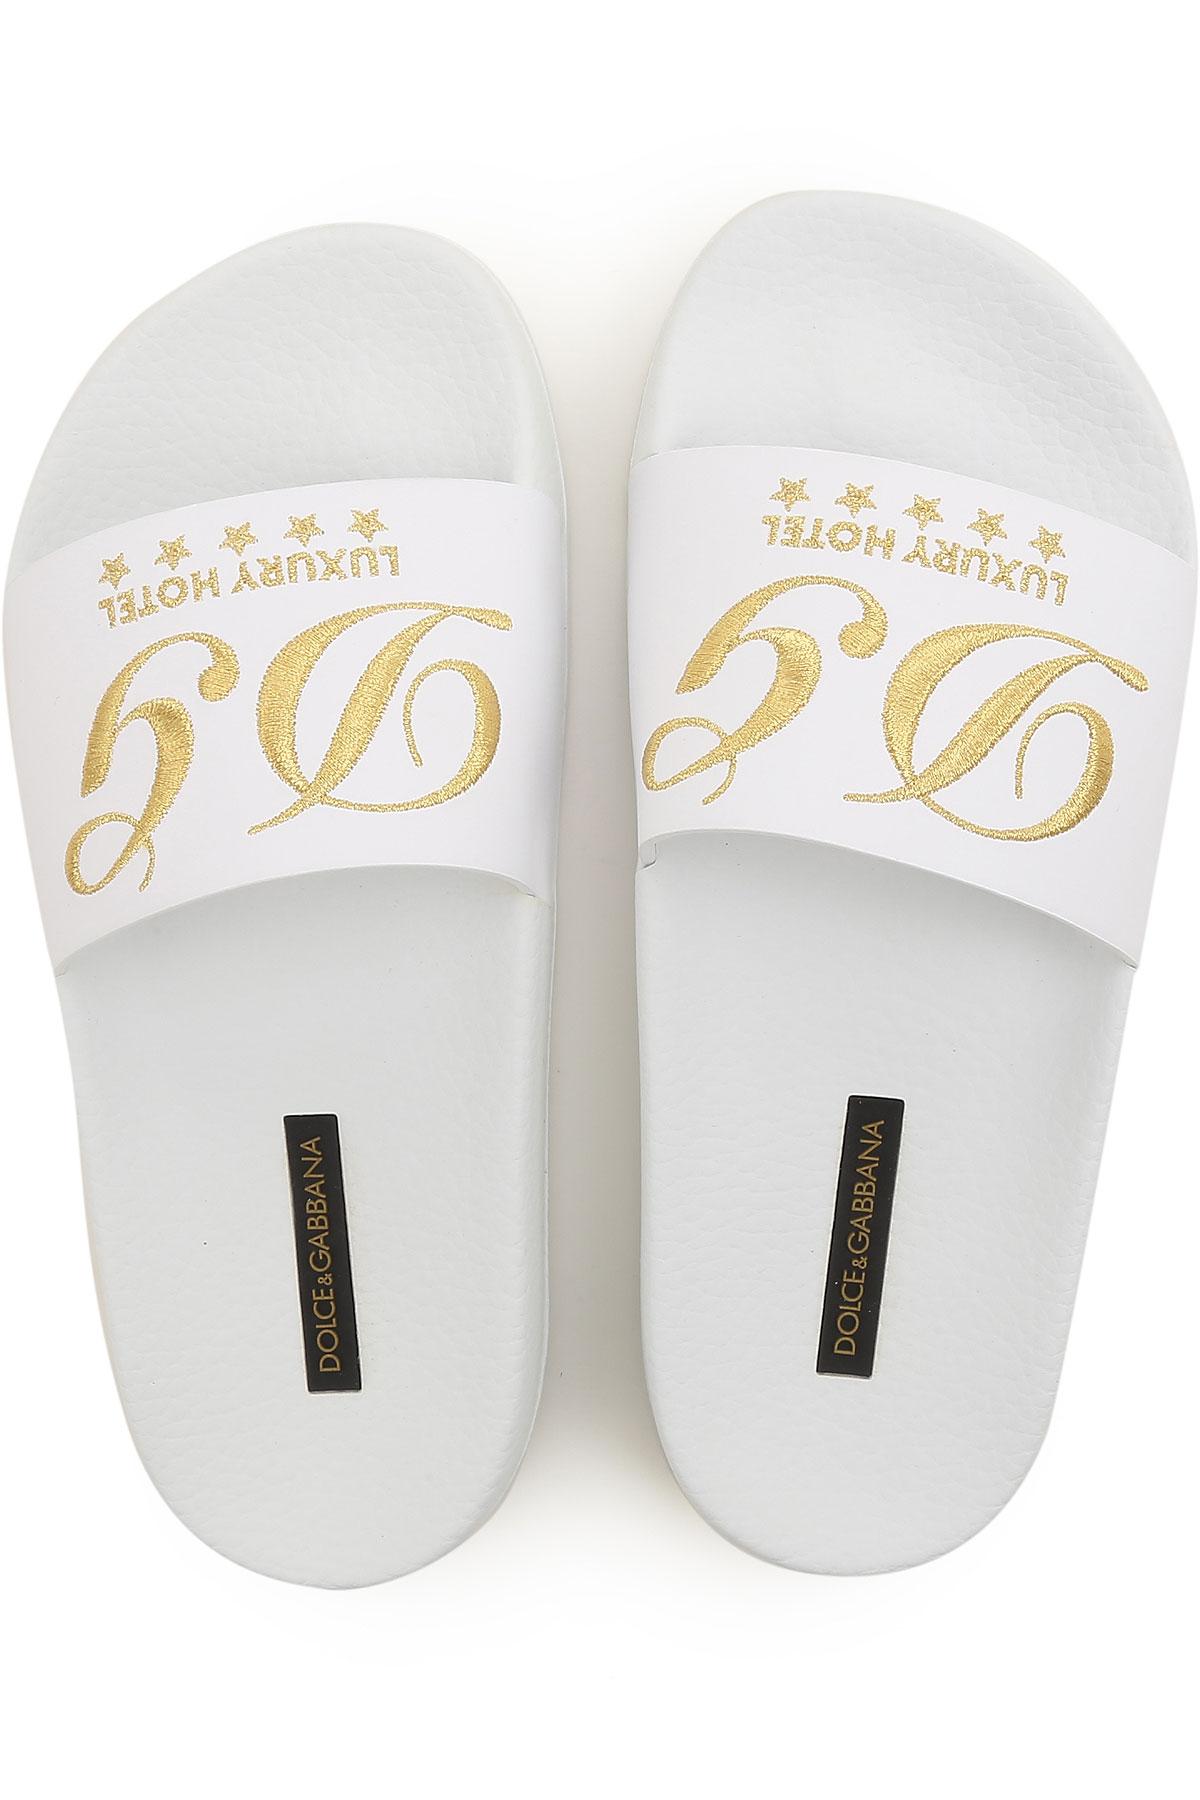 Scarpe Donna Dolce amp; Gabbana Offerte Limitate